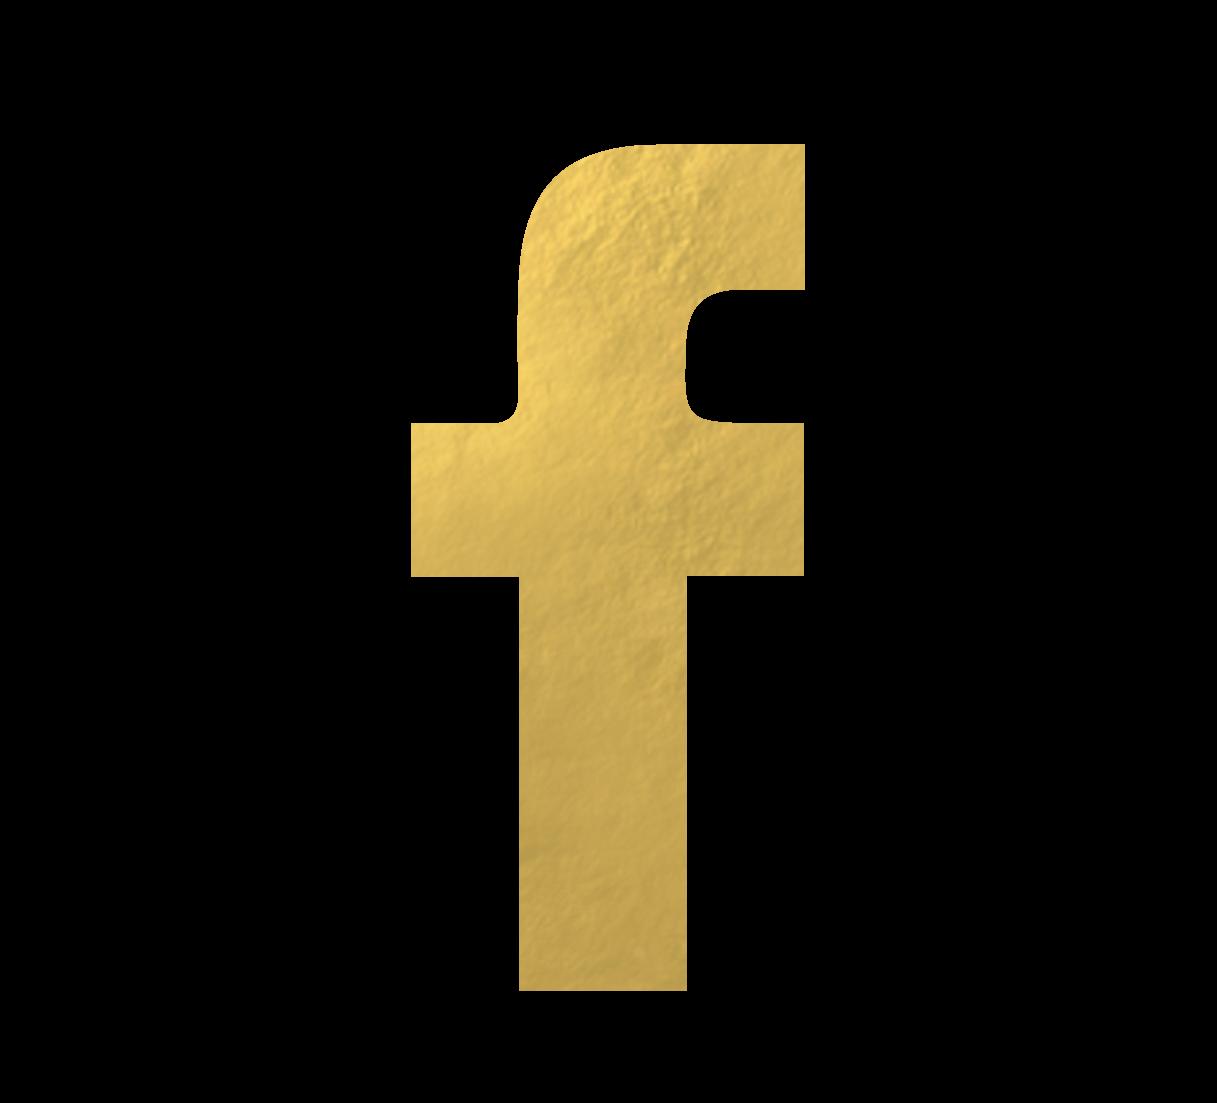 gold-foil-social-media-8-.png